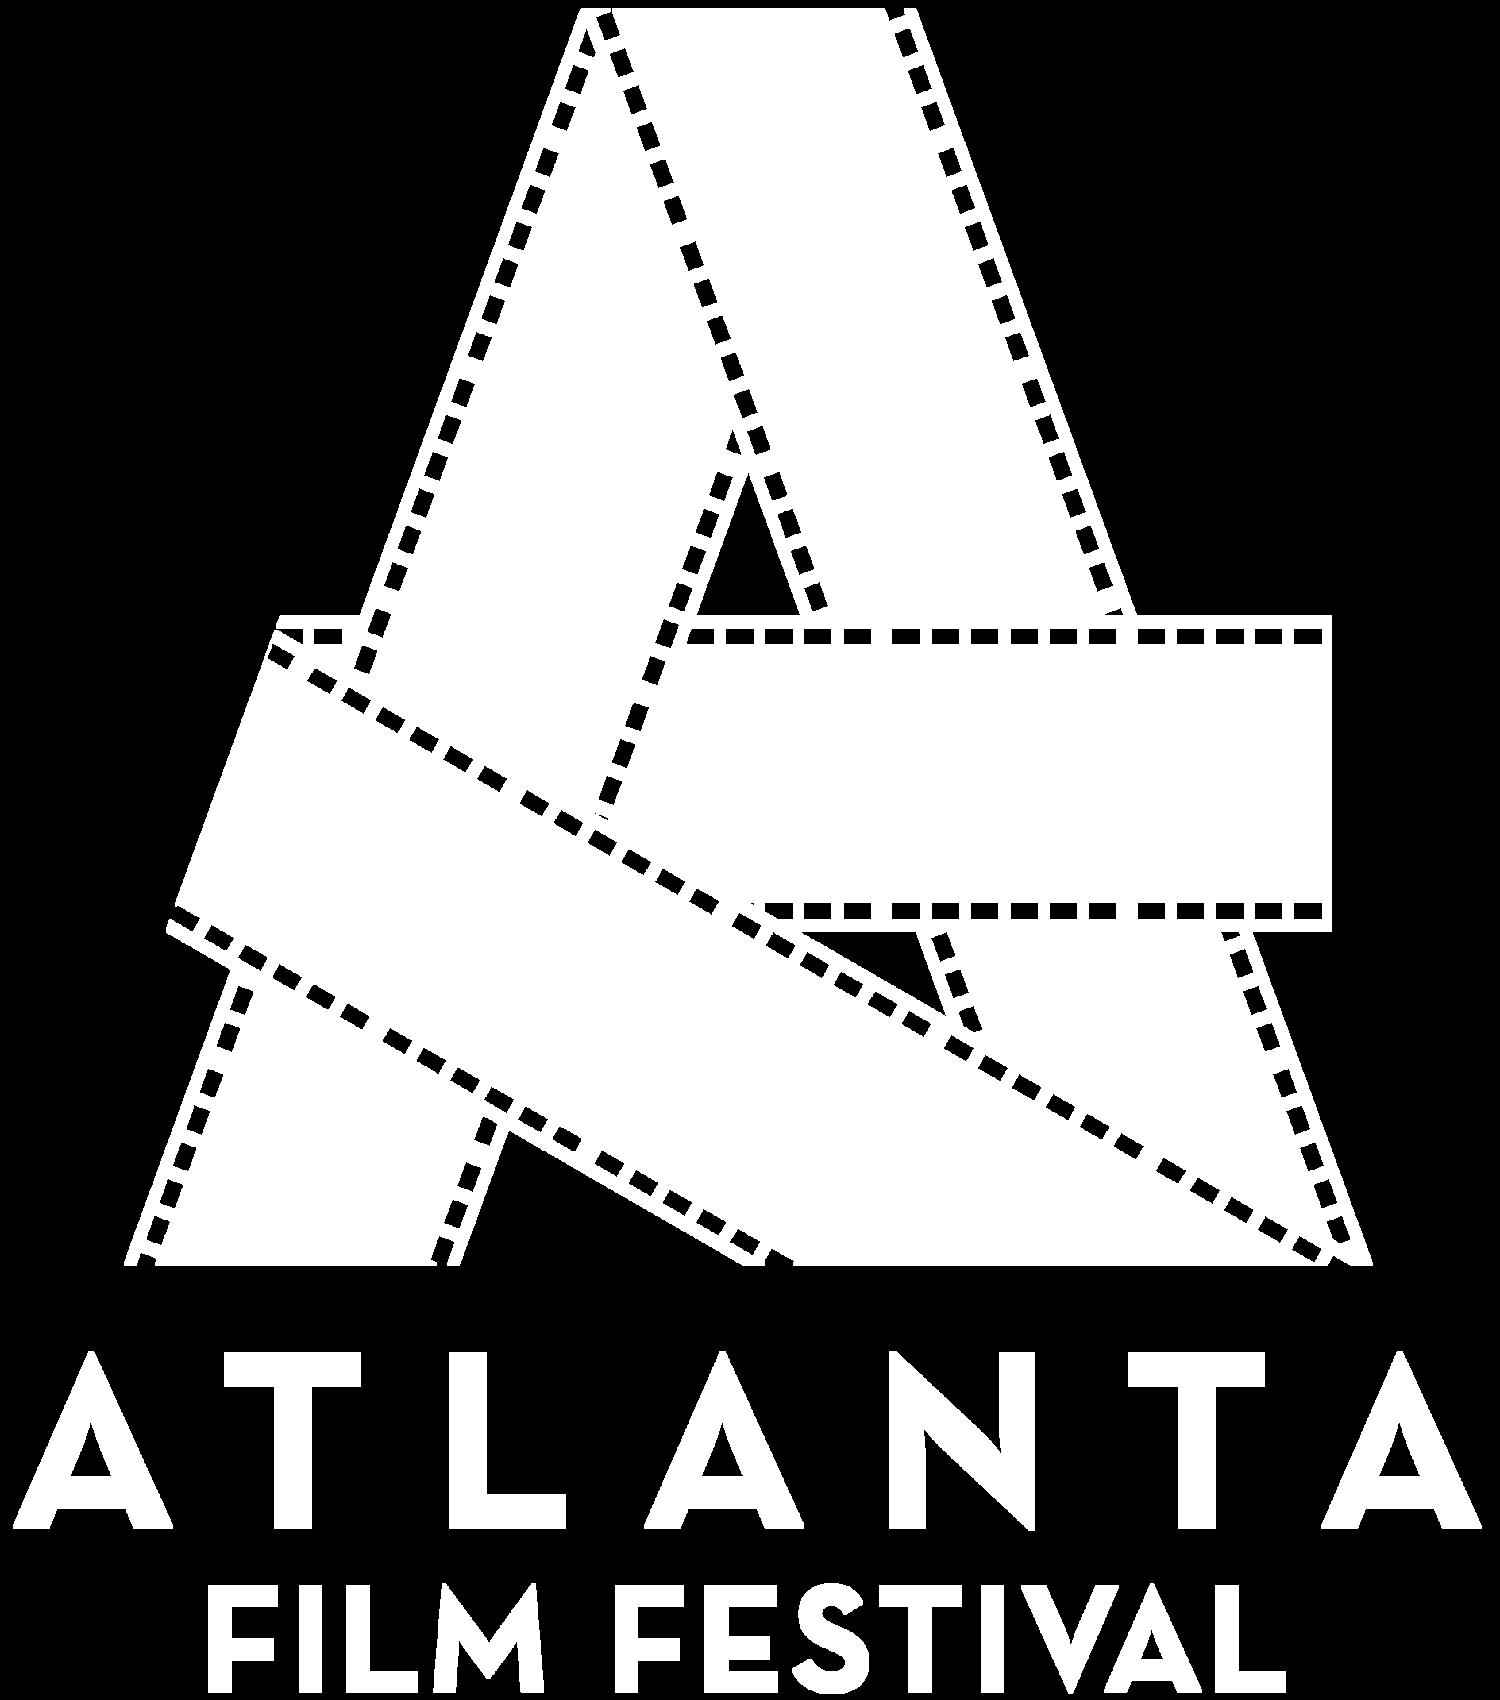 42nd Annual Atlanta Film Festival Announces Complete Lineup